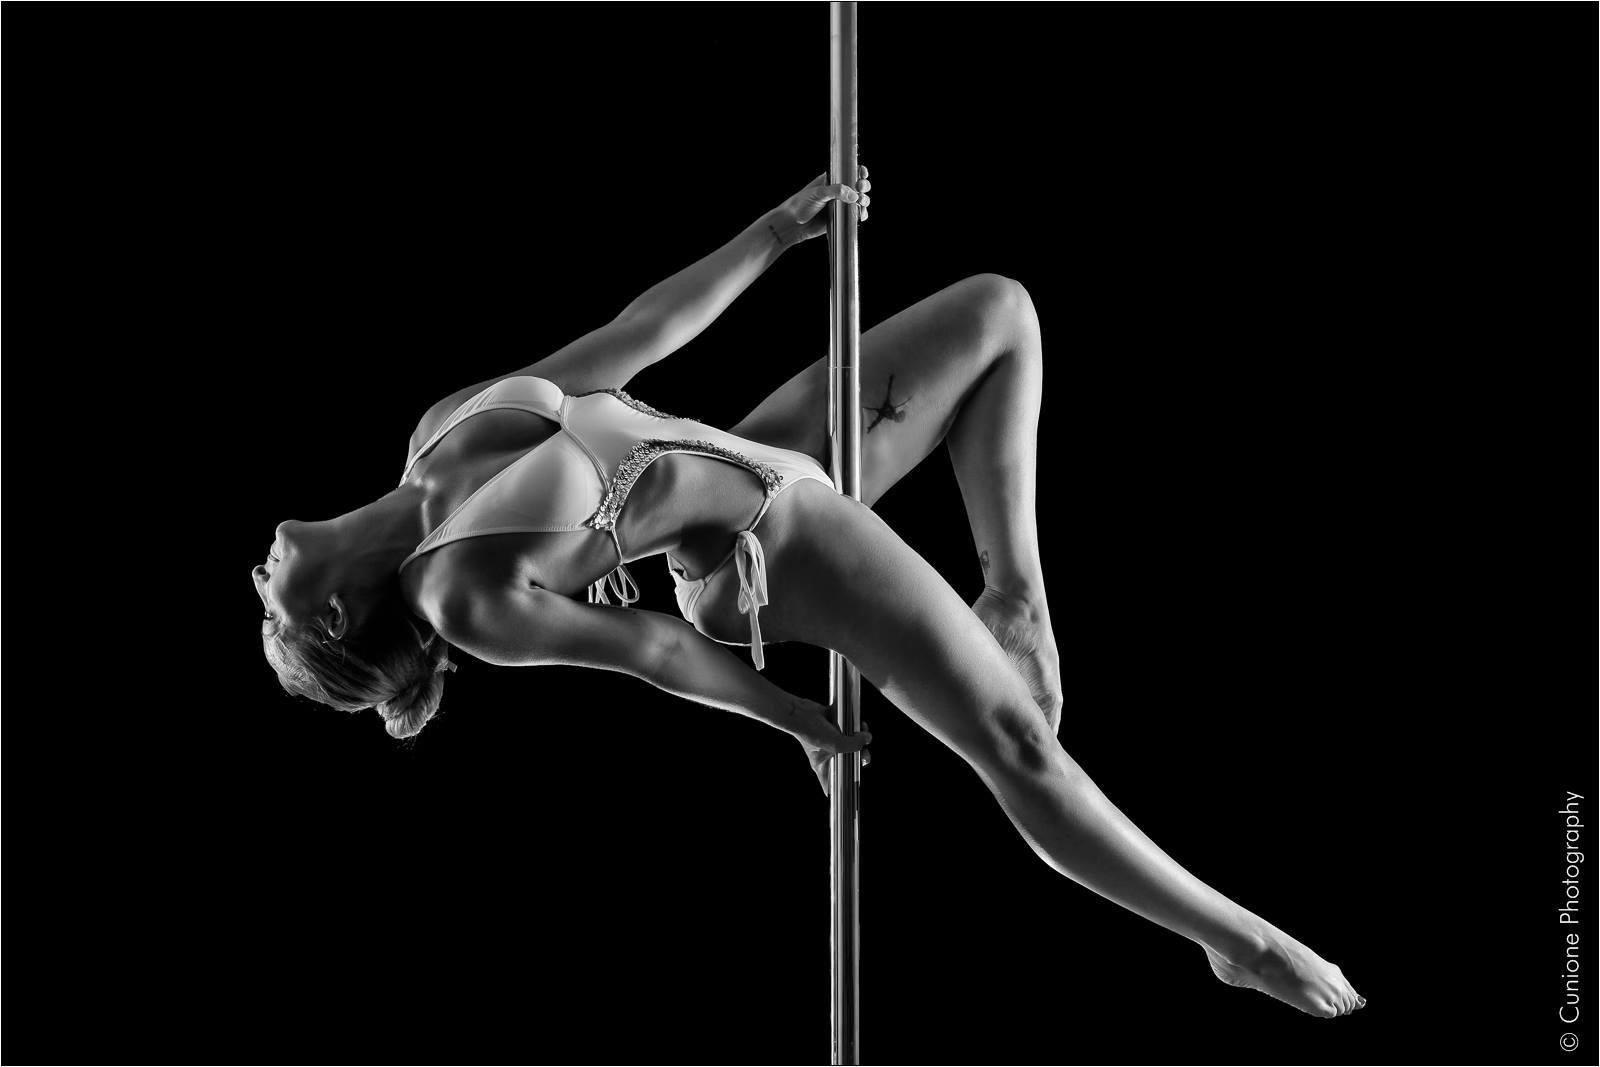 Shooting Stéphanie Vignardou par Nicolas Cunione @ Altiplano - Studio Photo (Montauroux - Pays de Fayence - Var)